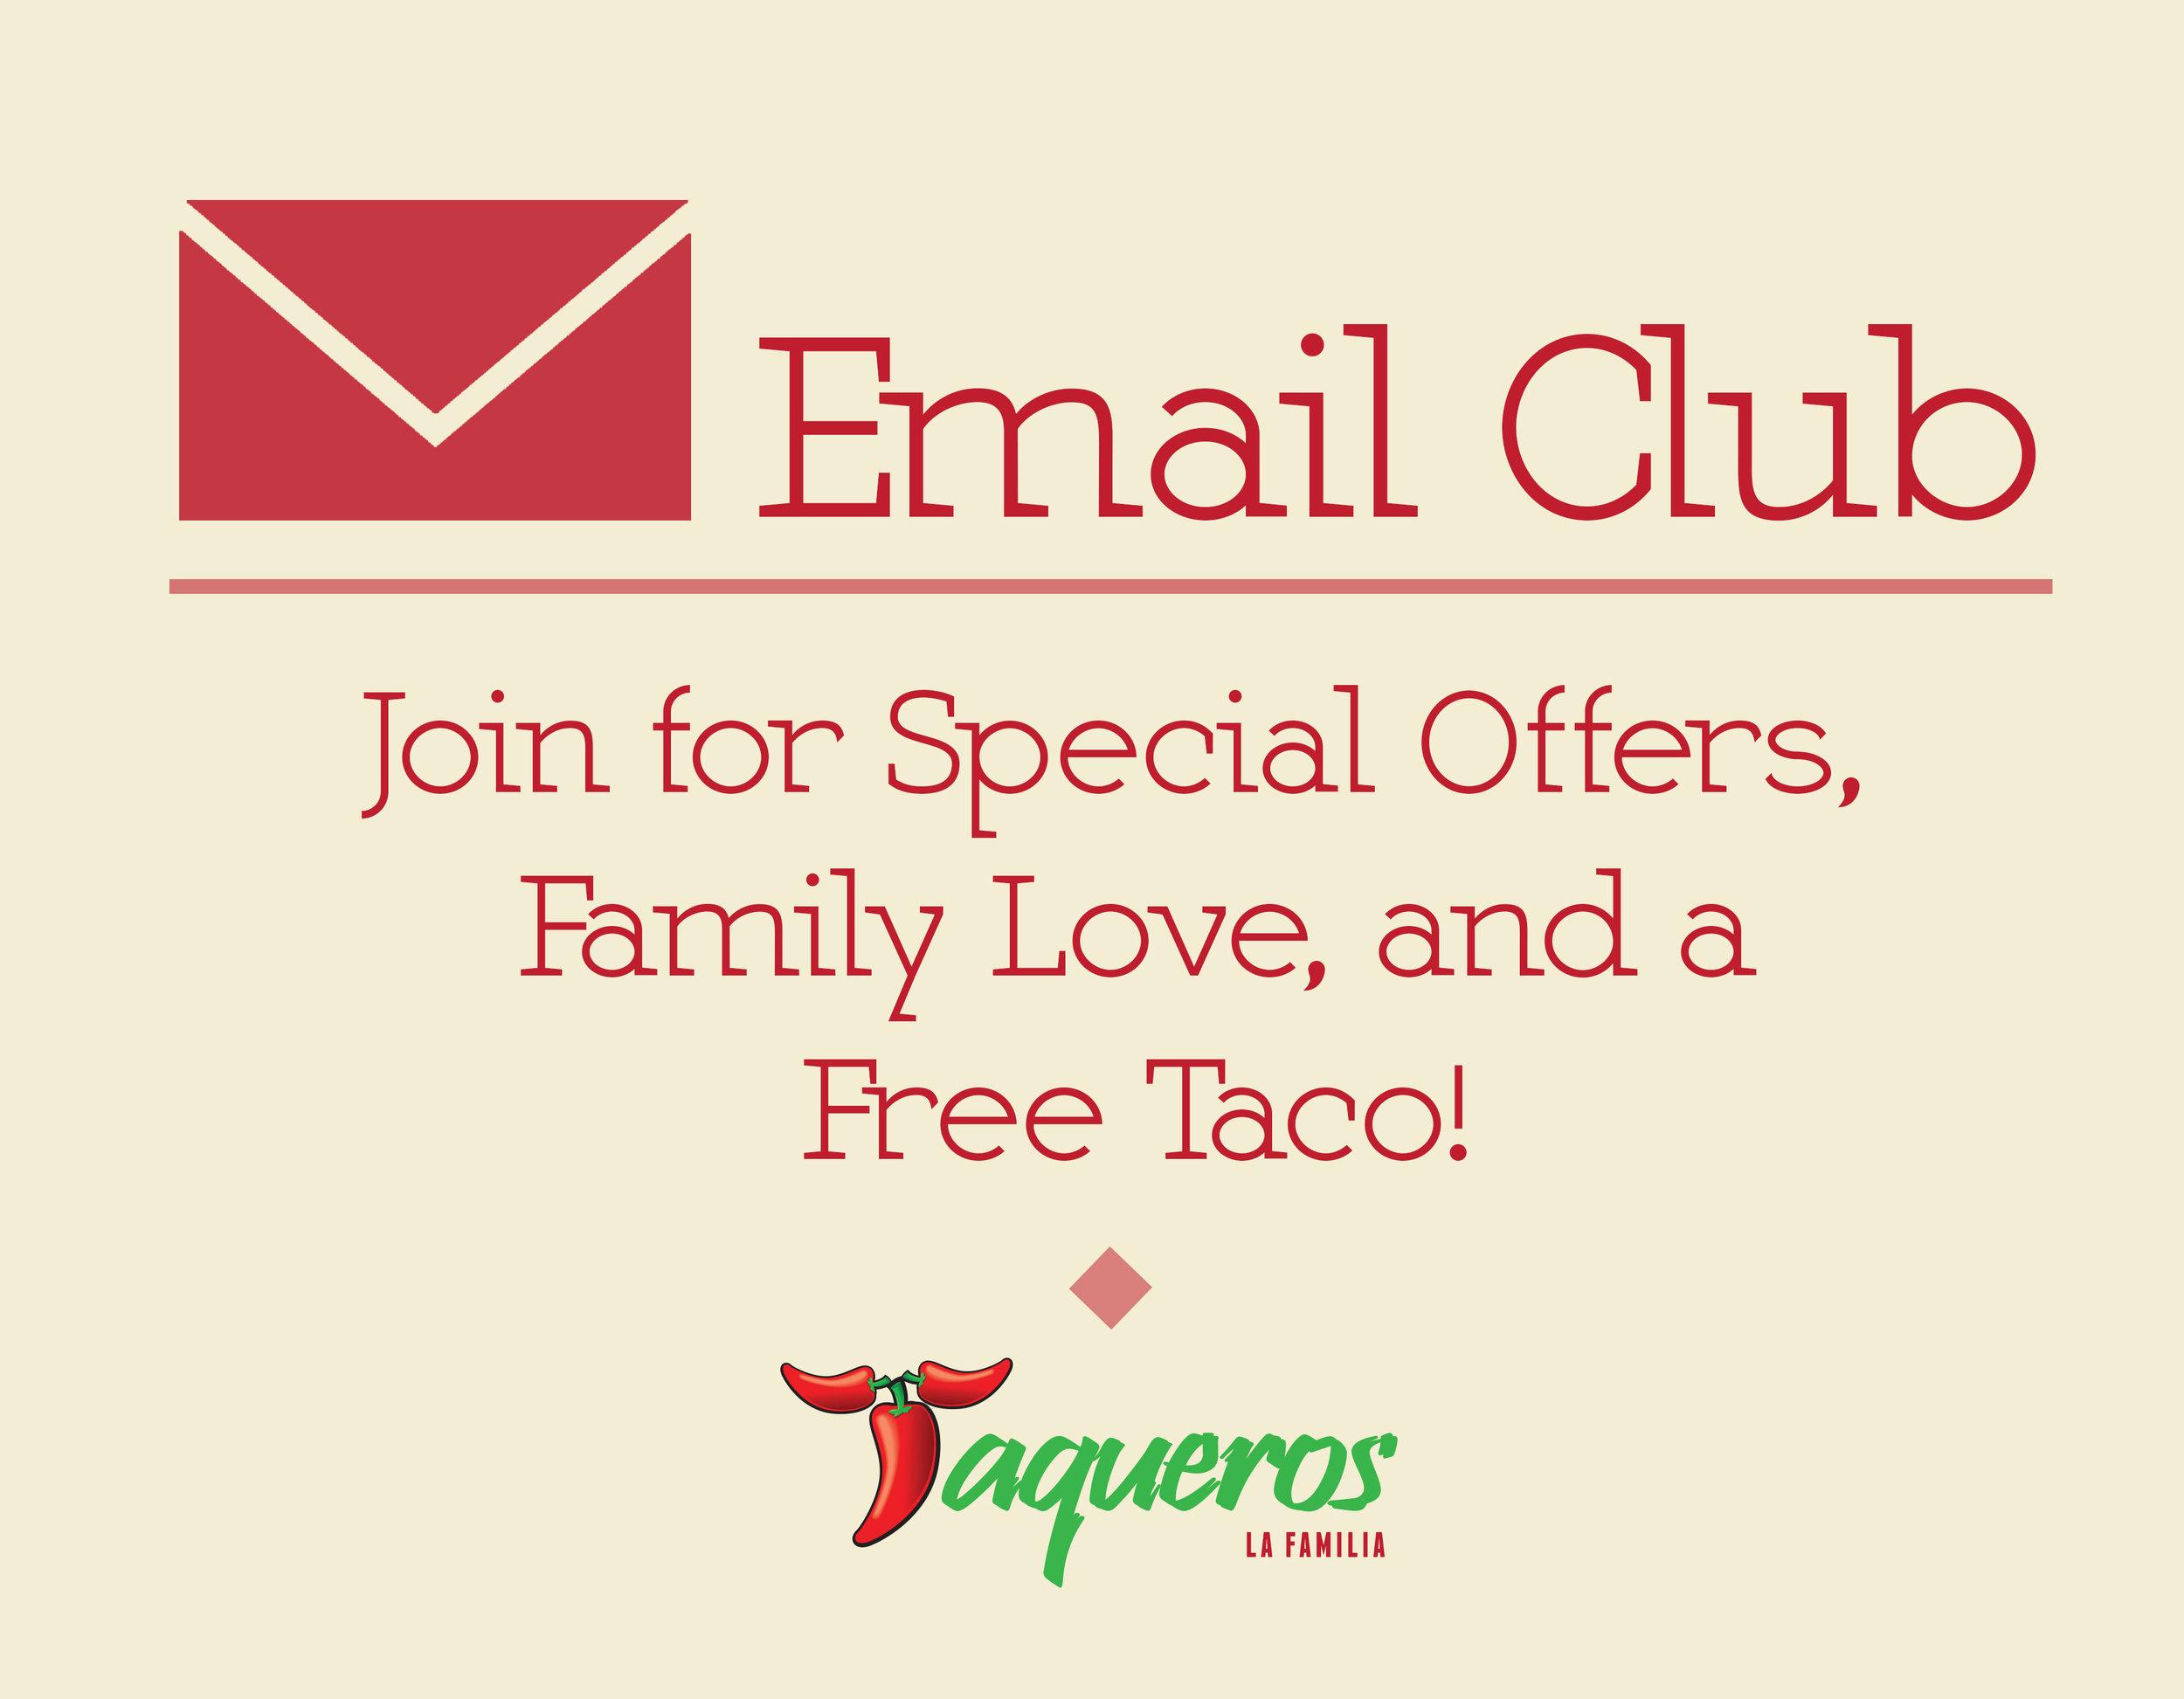 Taqueros Mexican Restaurant Email Club